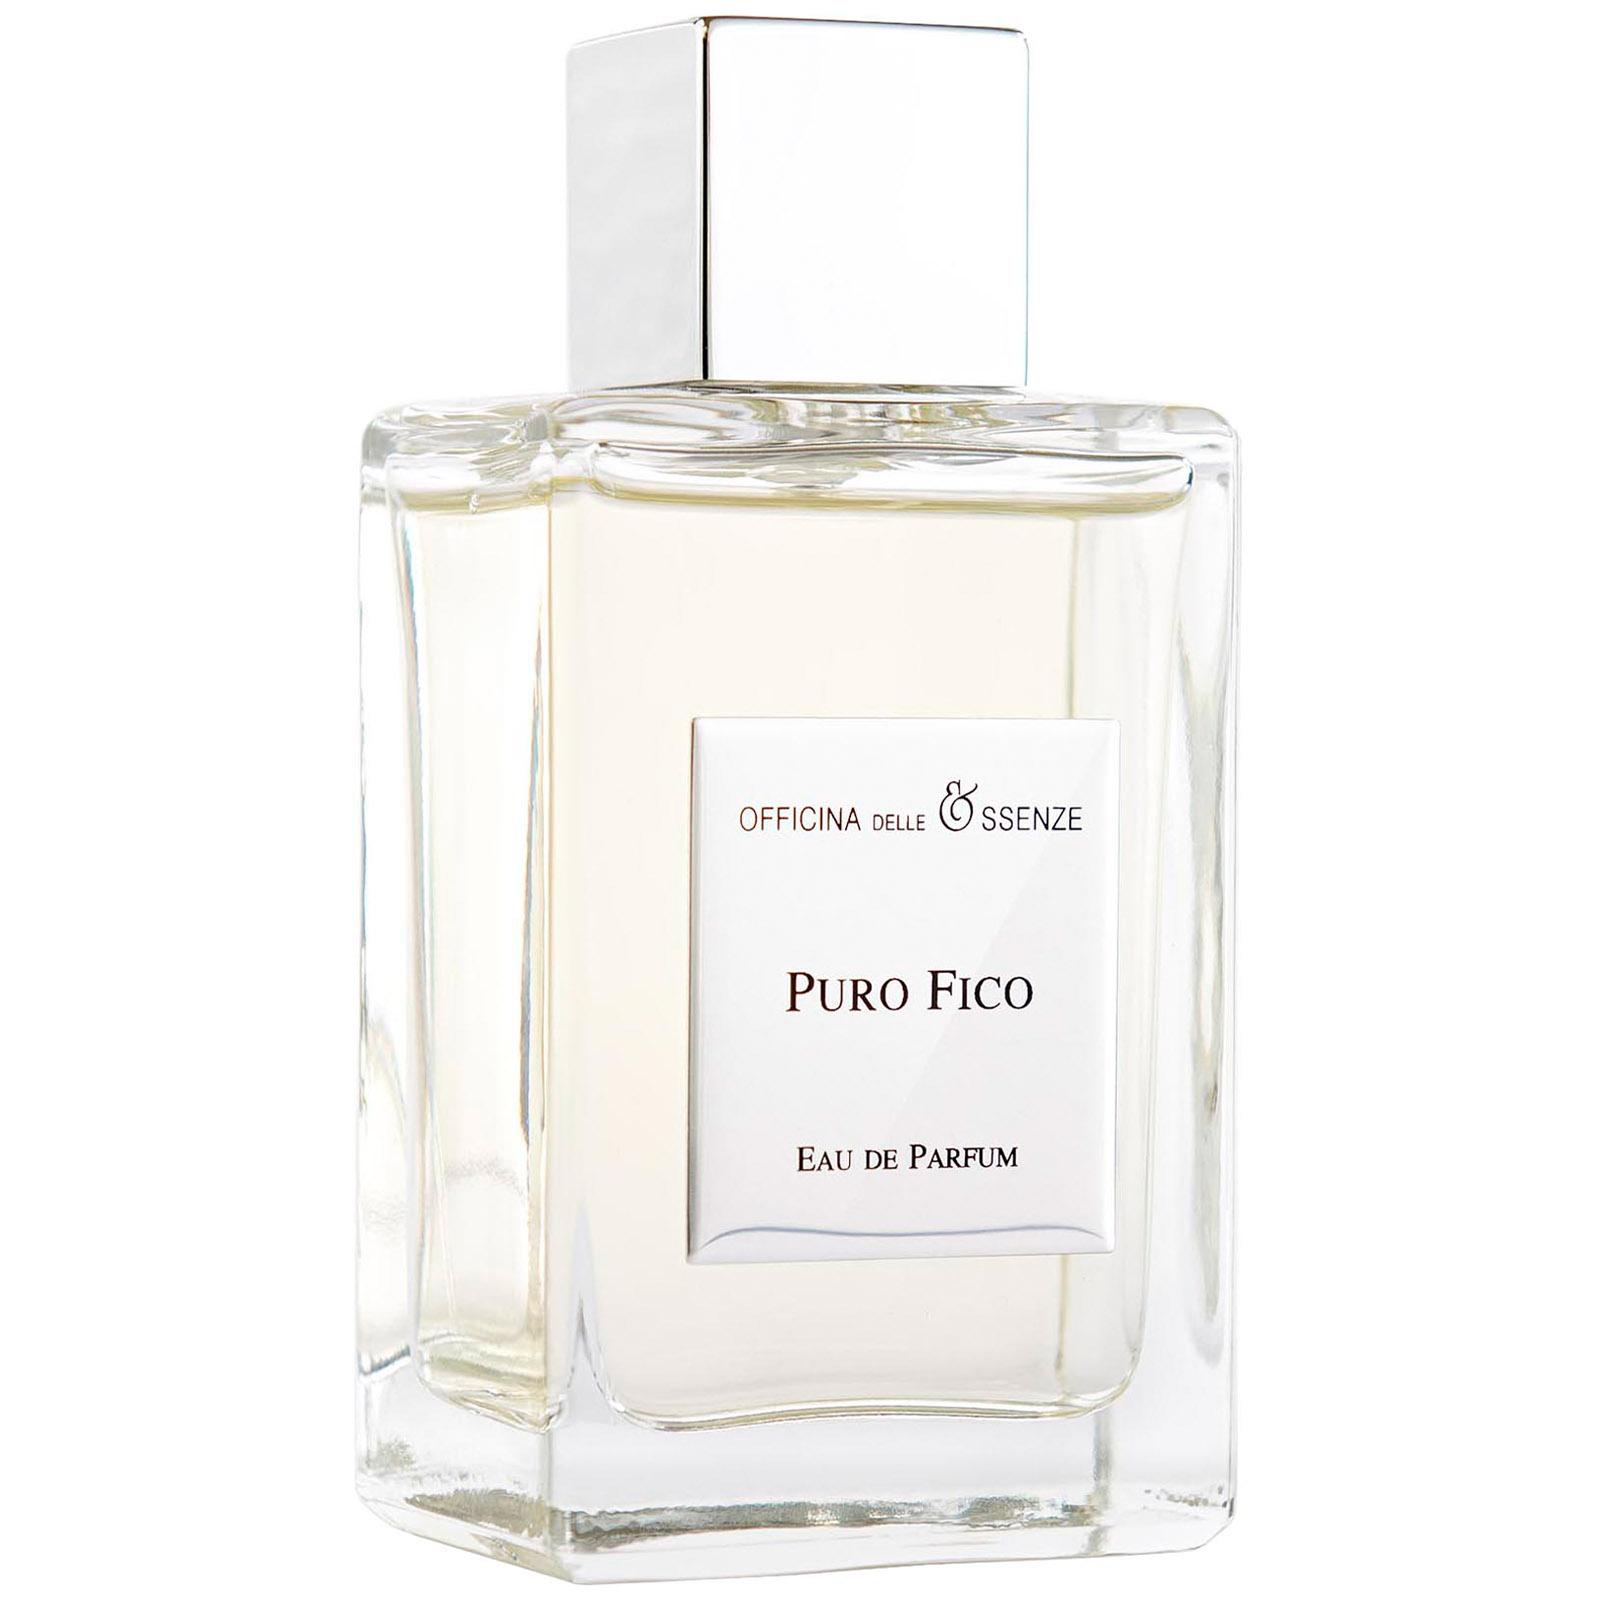 Puro fico profumo eau de parfum 100 ml